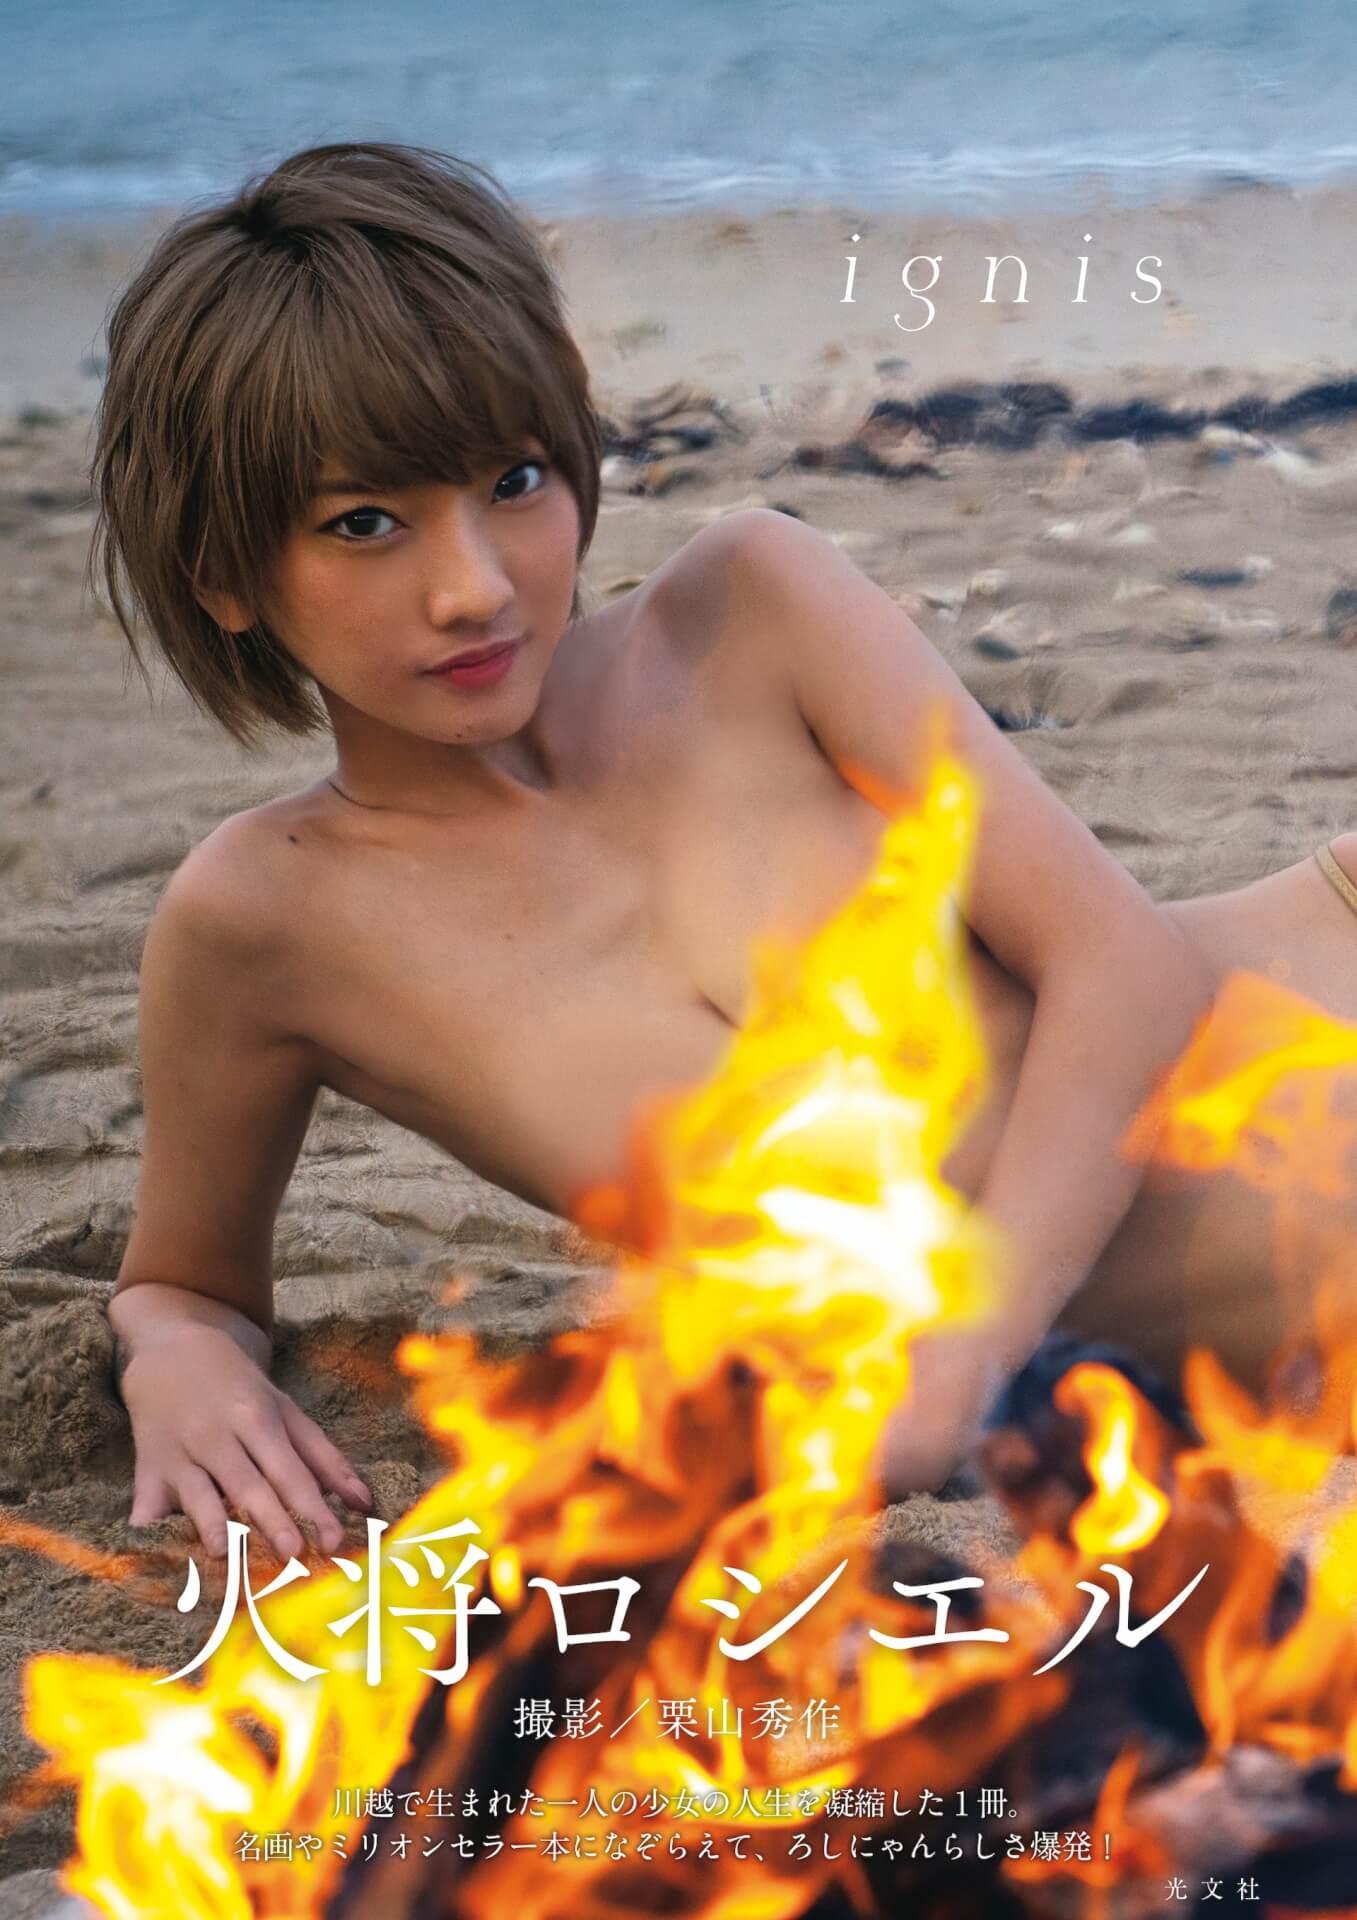 『FLASH』に登場した火将ロシエルが木陰からのギリギリ限界カットに挑戦!鈴木愛理の表紙&巻頭グラビアも art211005_flash_5